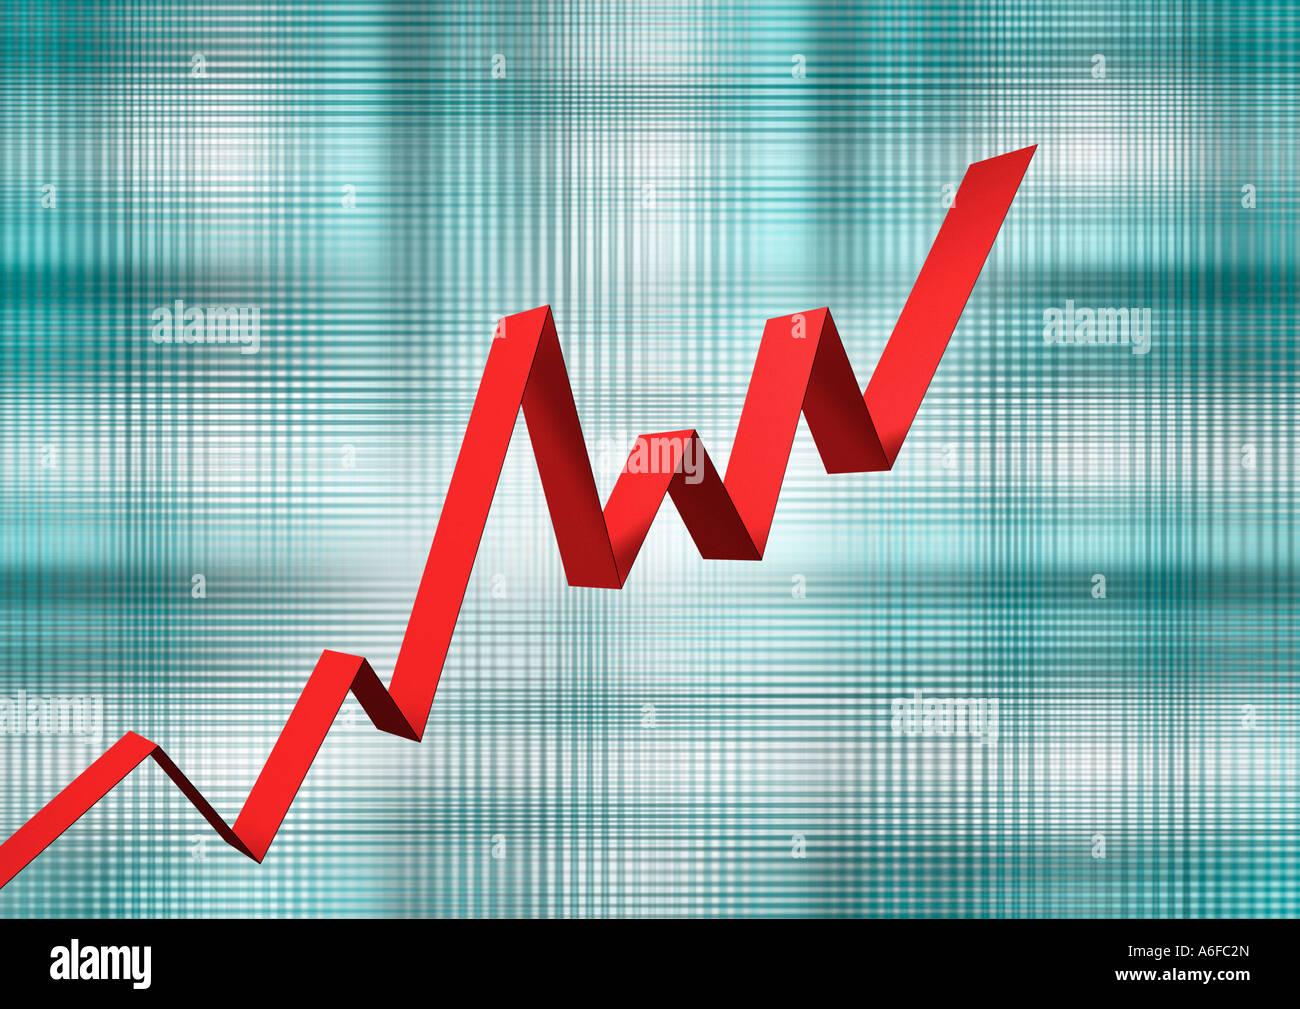 chart stock market index Börsenchart Kurve Kurs Stock Photo